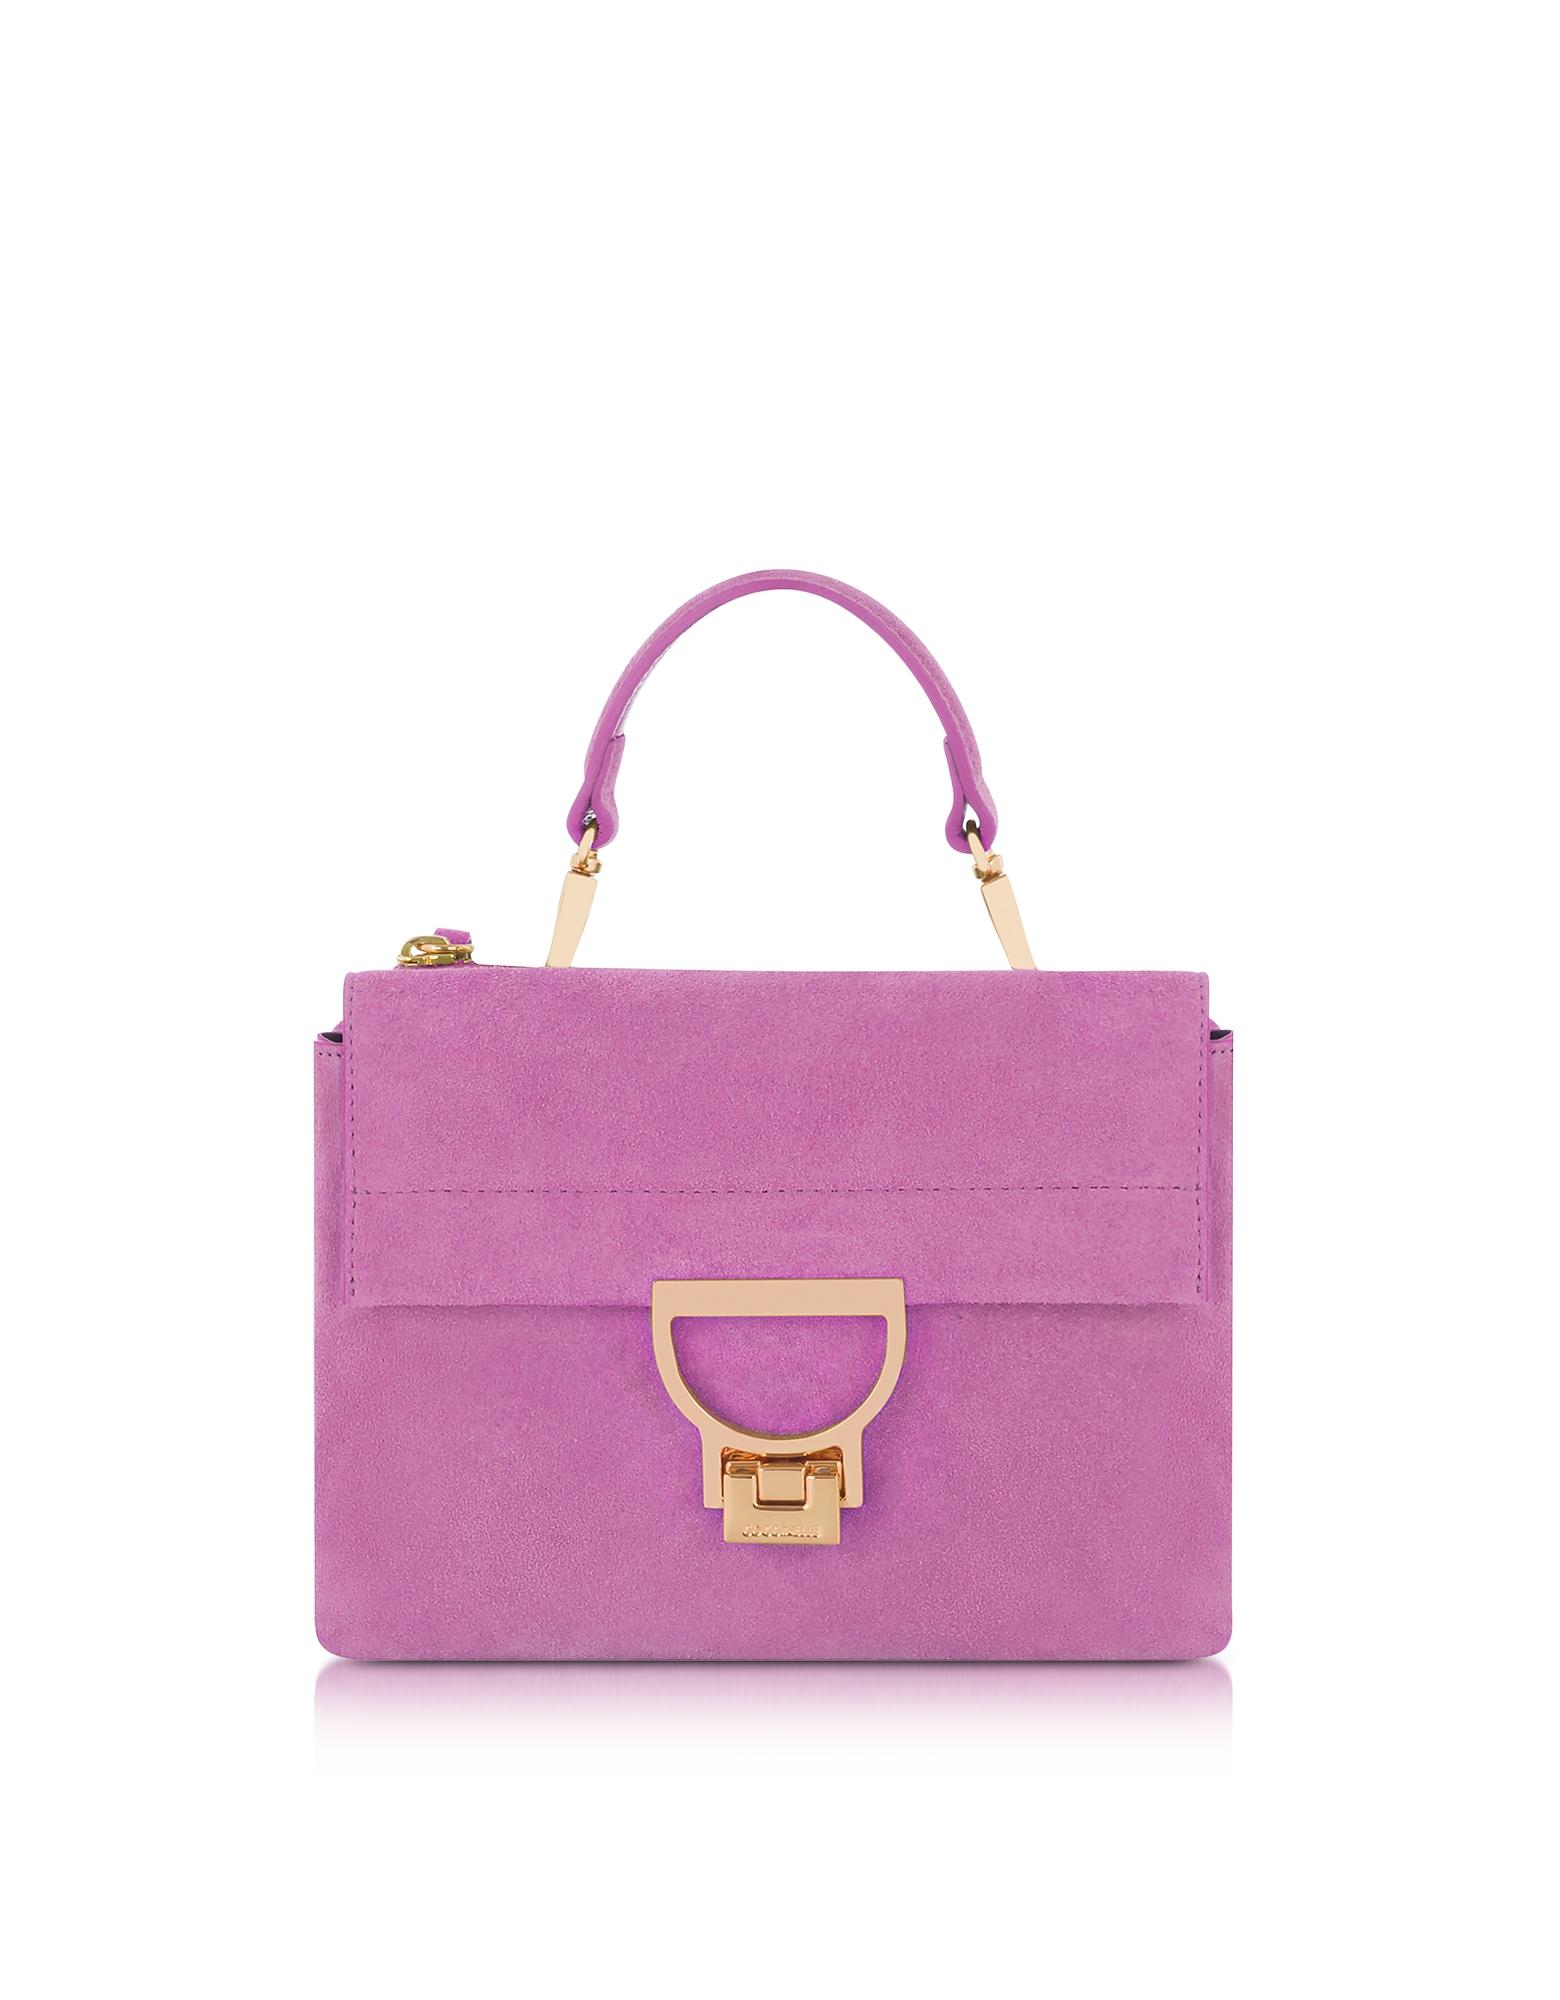 Coccinelle Handbags, Suede Arlettis Mini Bag w/Shoulder Strap